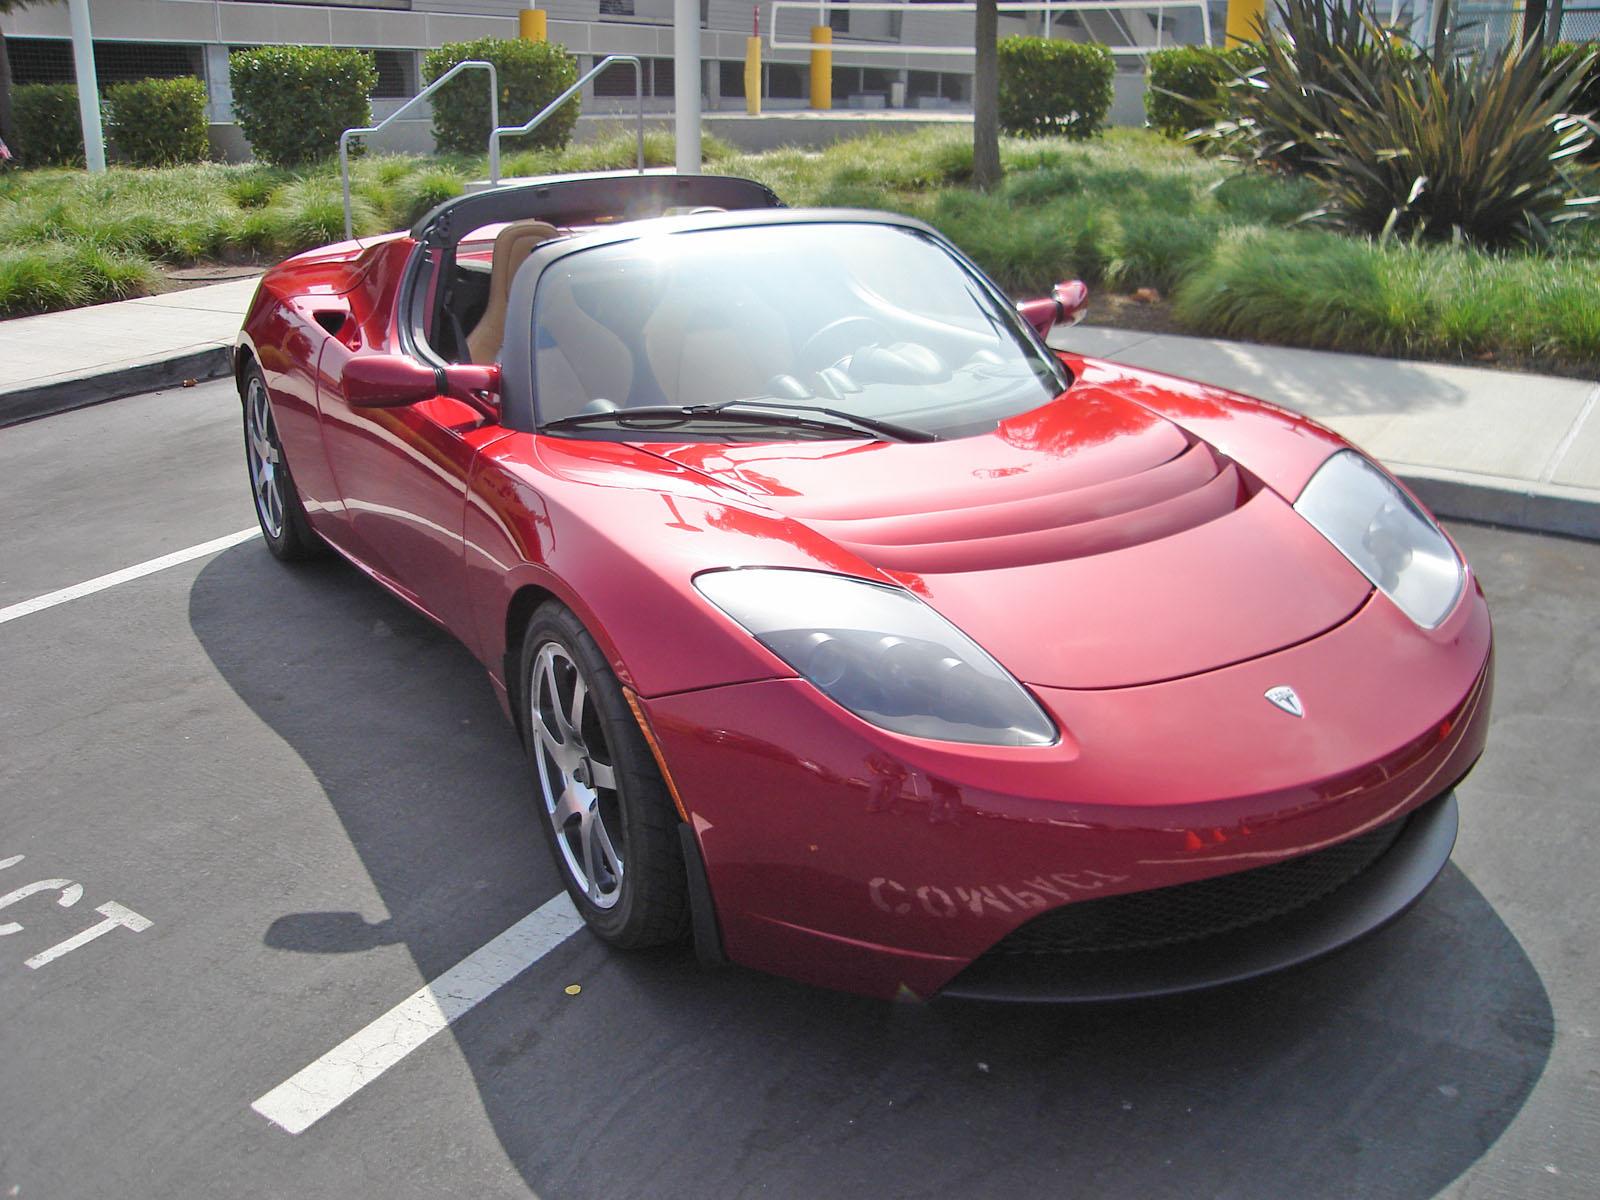 #23. Tesla Roadster Version 1